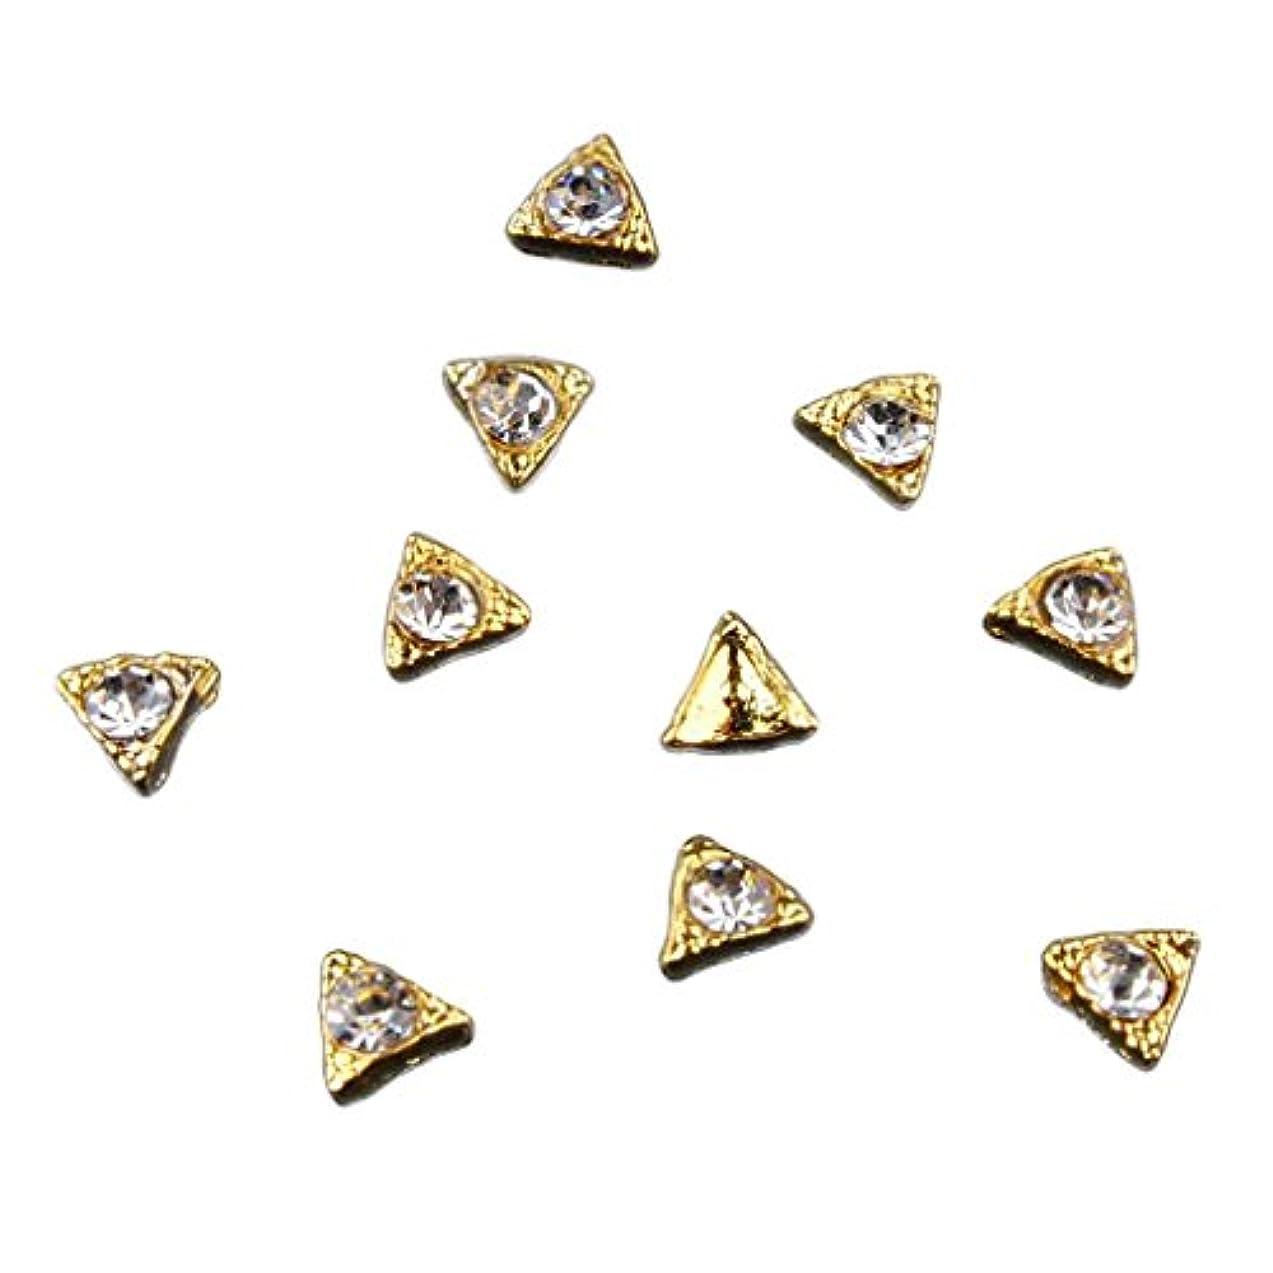 CUTICATE 50個入り ネイル ネイルデザイン ダイヤモンド 3Dネイルアート ヒントステッカー デコレーション - 7